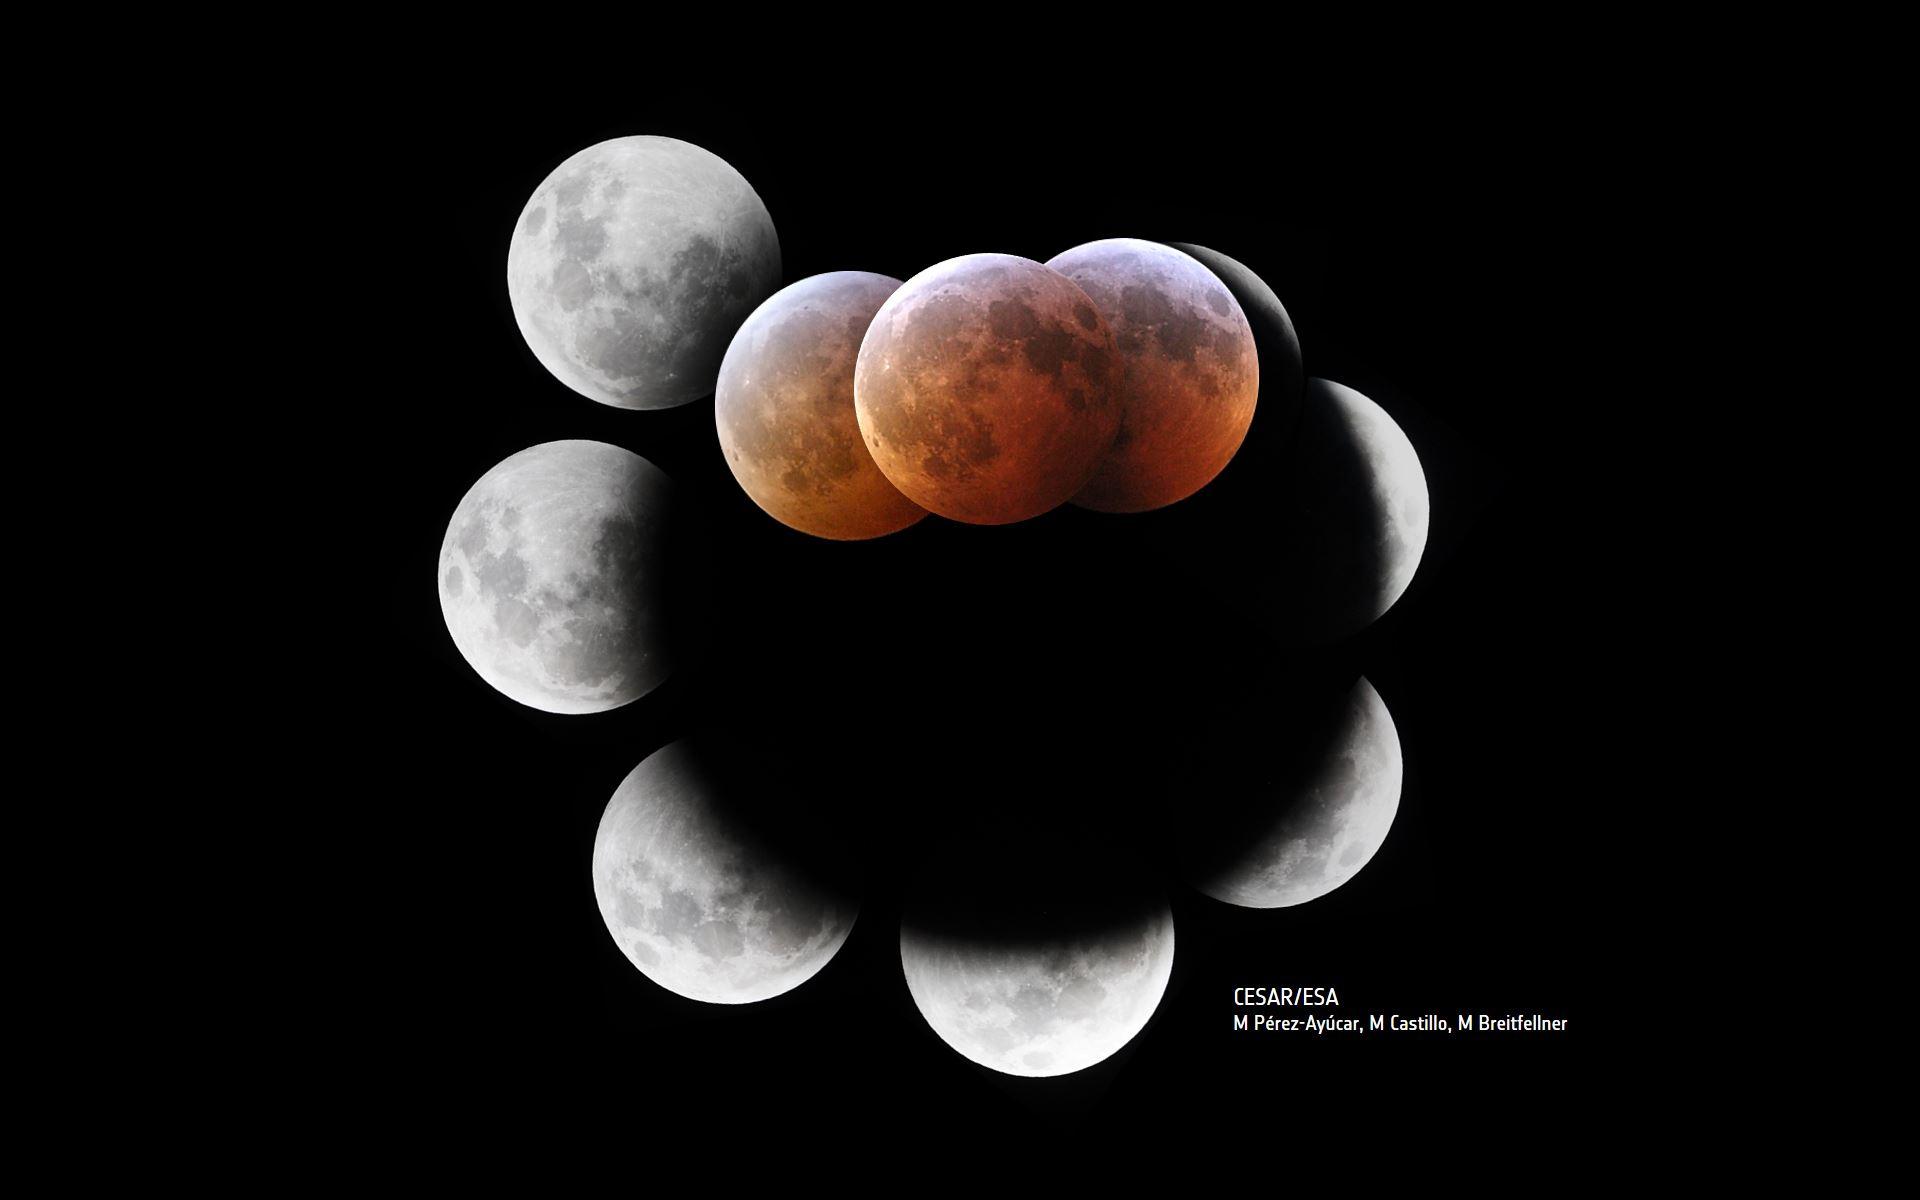 CESAR News - Lunar eclipse from ESAC, 21 Jan 2019